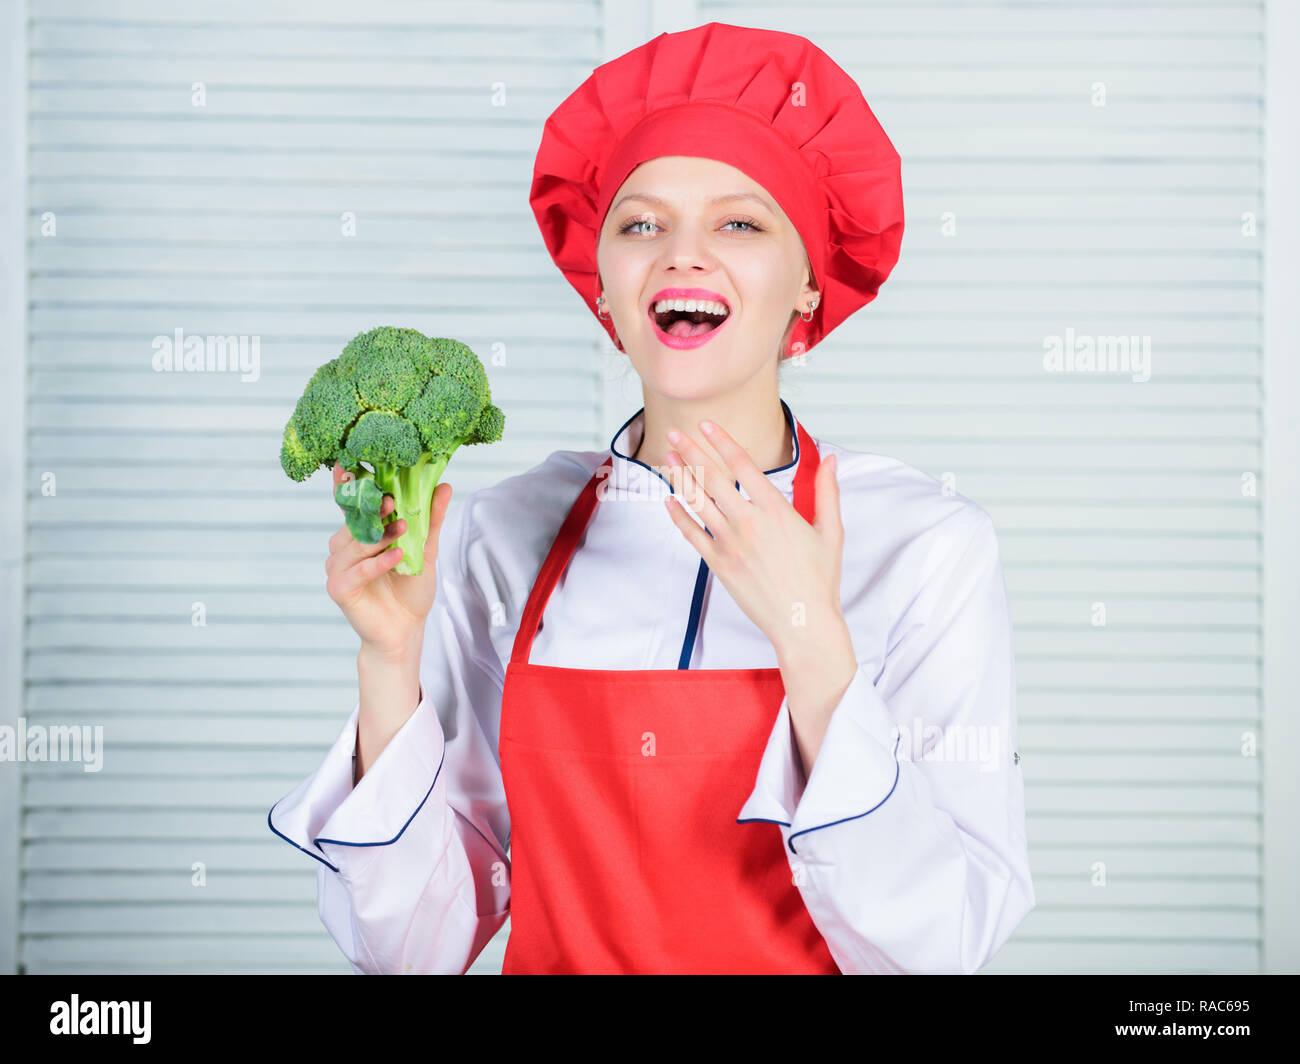 Free healthy vegetarian and vegan recipes  Turn broccoli